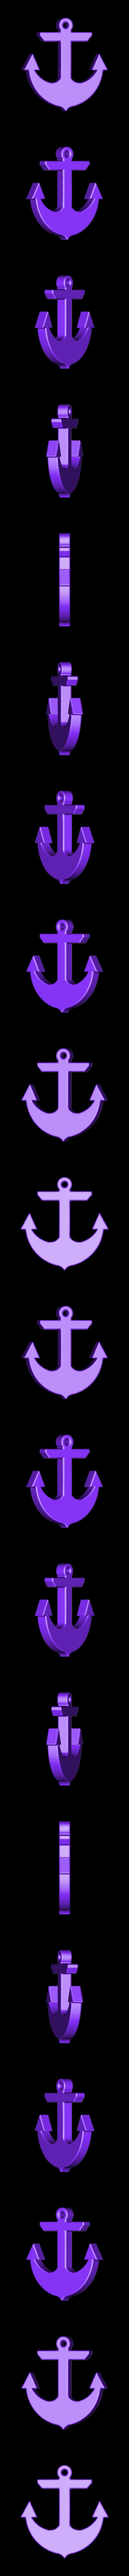 Anker_breed.obj Download free OBJ file Anchor - nautical key float / buoy • 3D printer design, petclaud